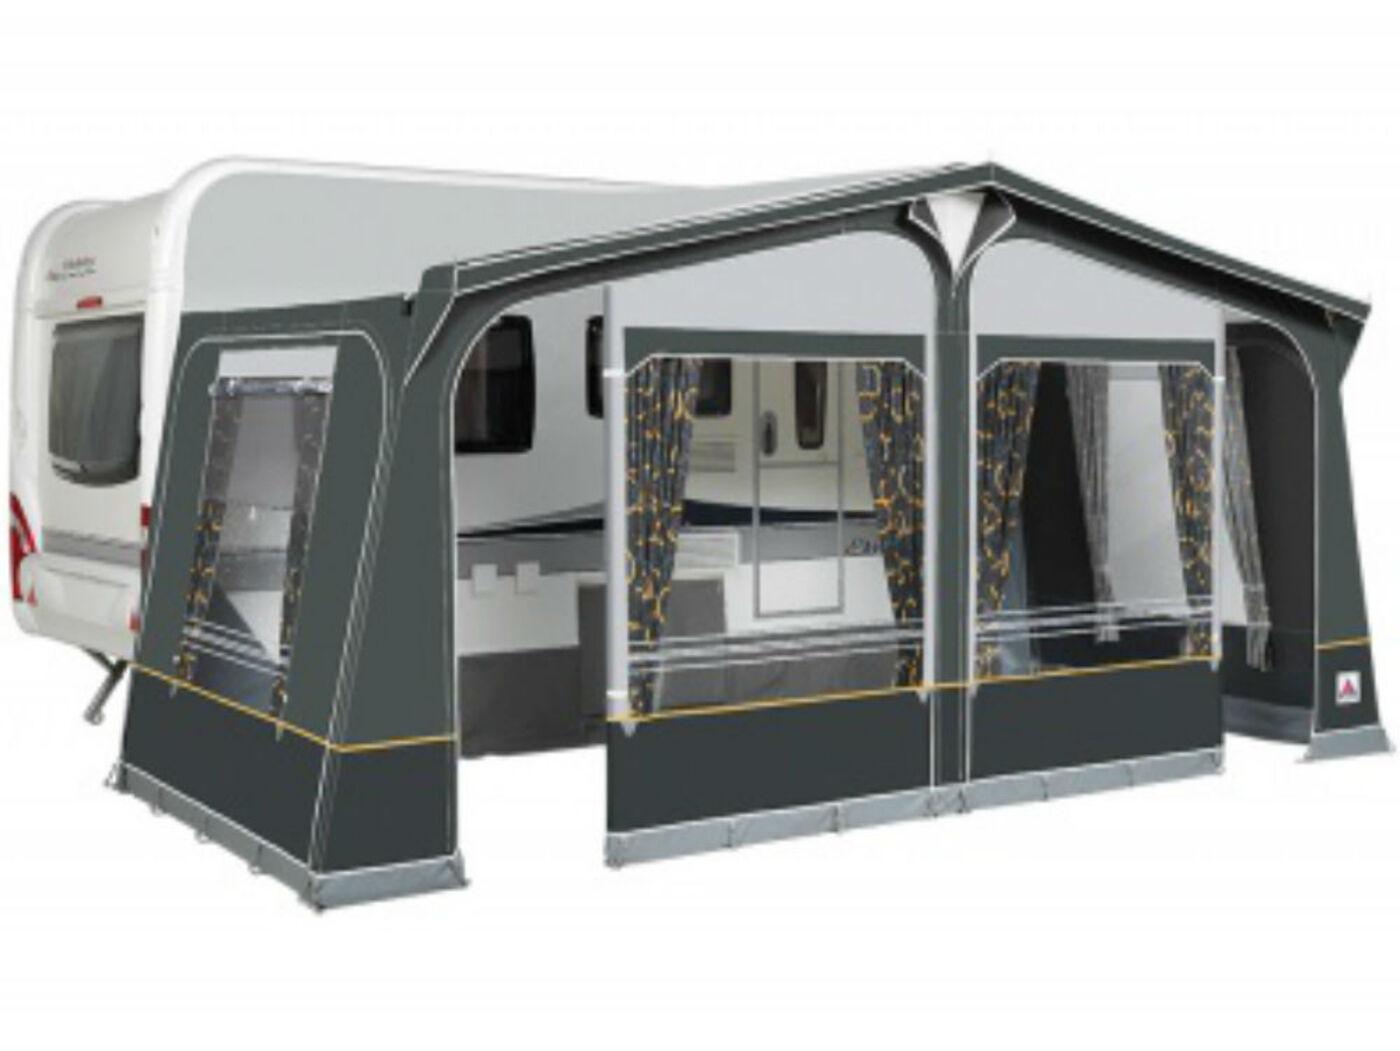 Dorema Daytona Caravan Awning Homestead Caravans